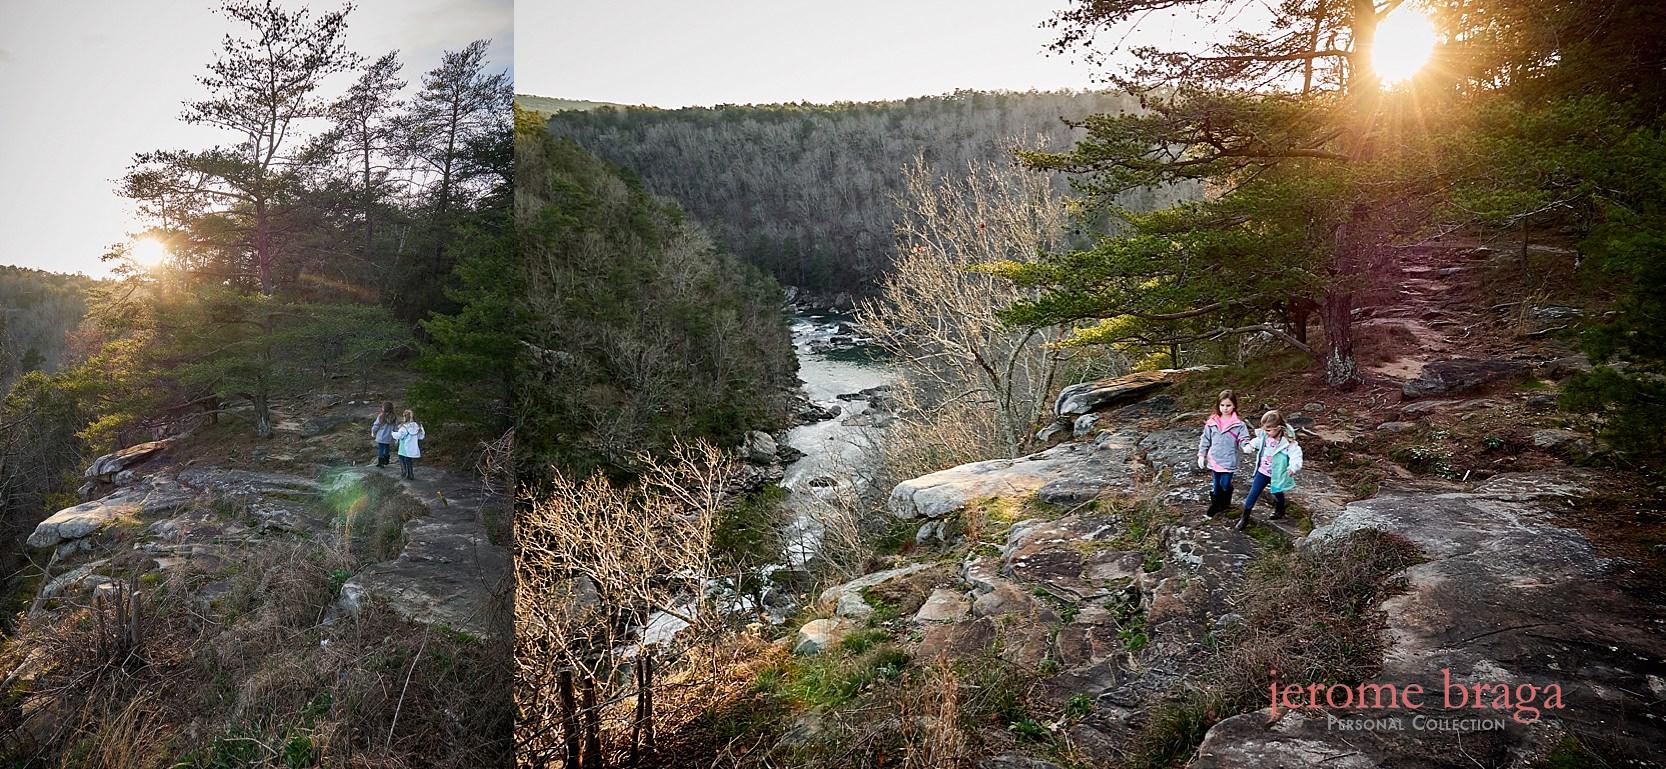 Little River RV Park, Alabama RV camping spots in Alabama